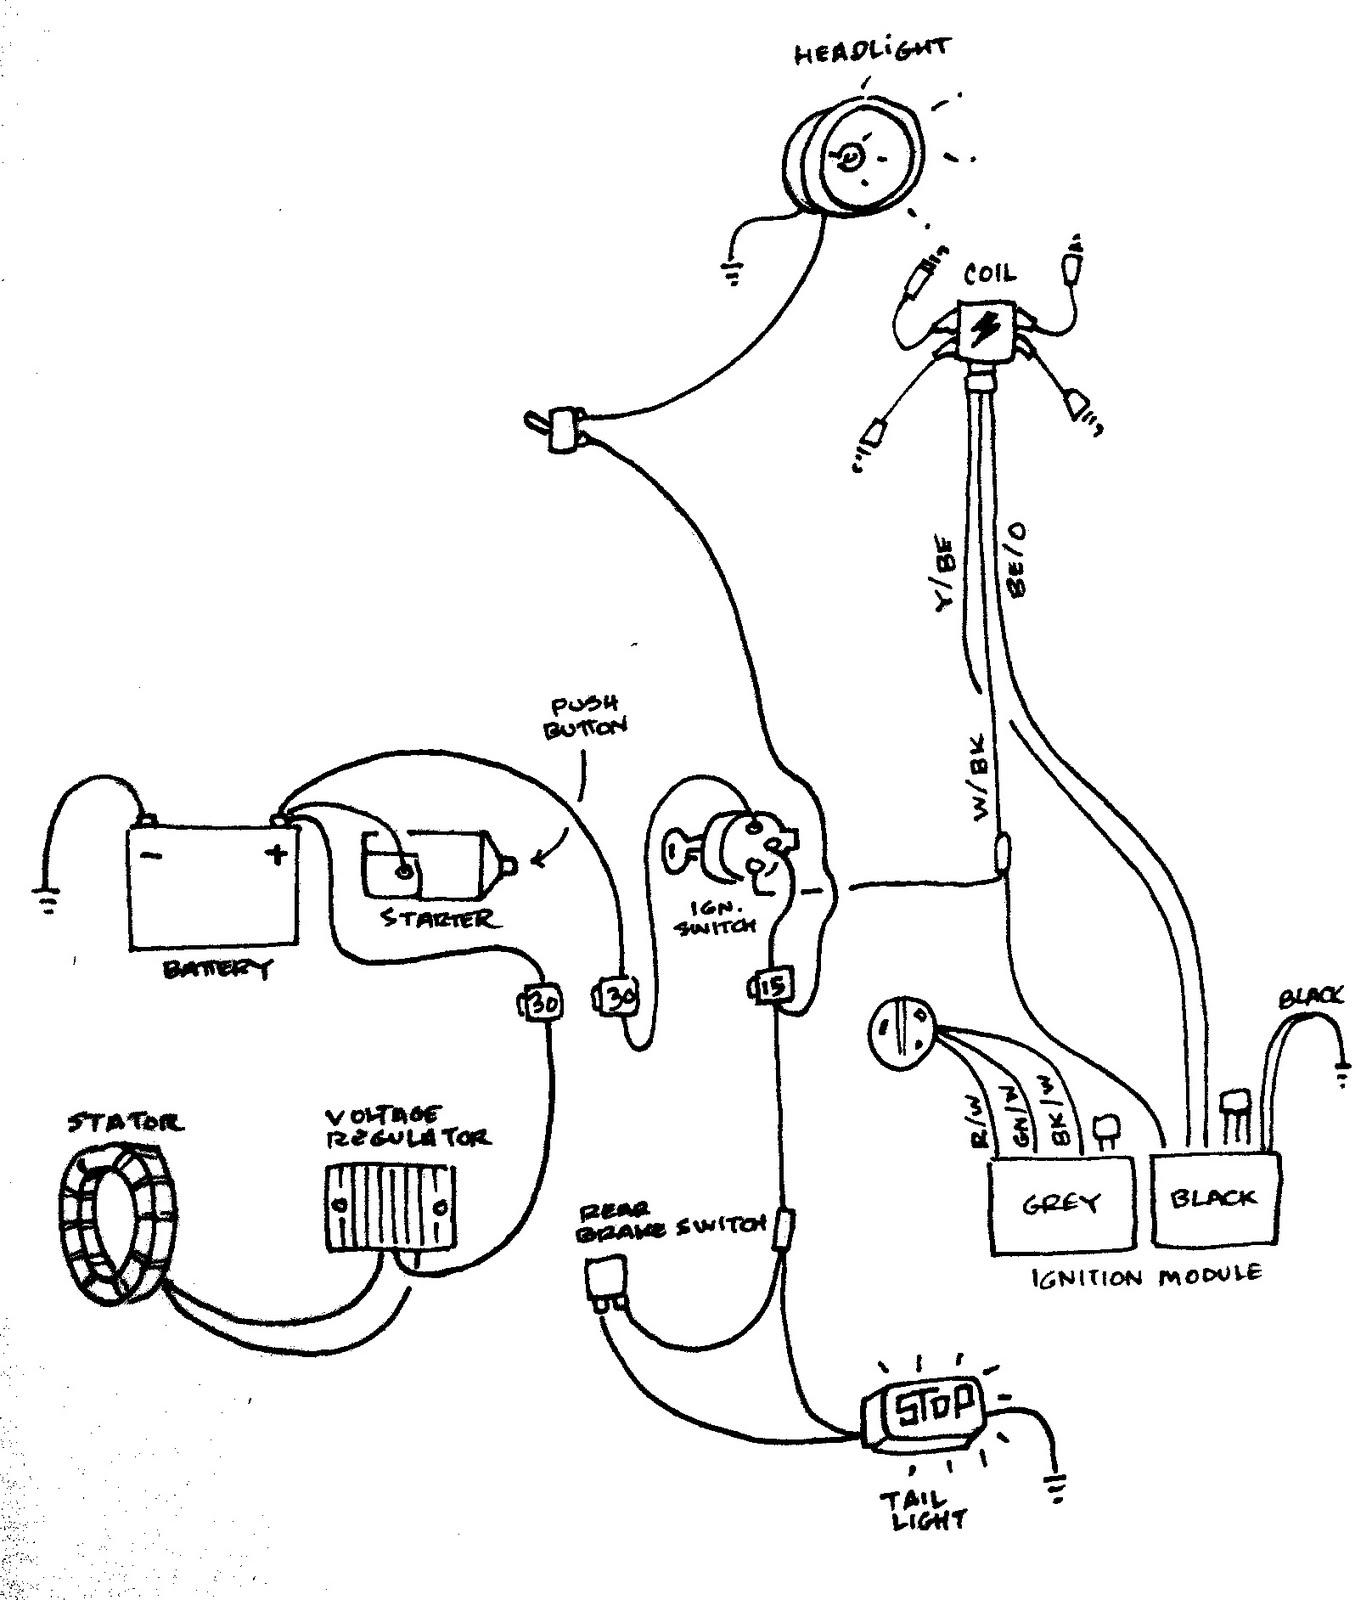 Attractive Atv 110ccm Anschlussplan Photo - Electrical Diagram Ideas ...